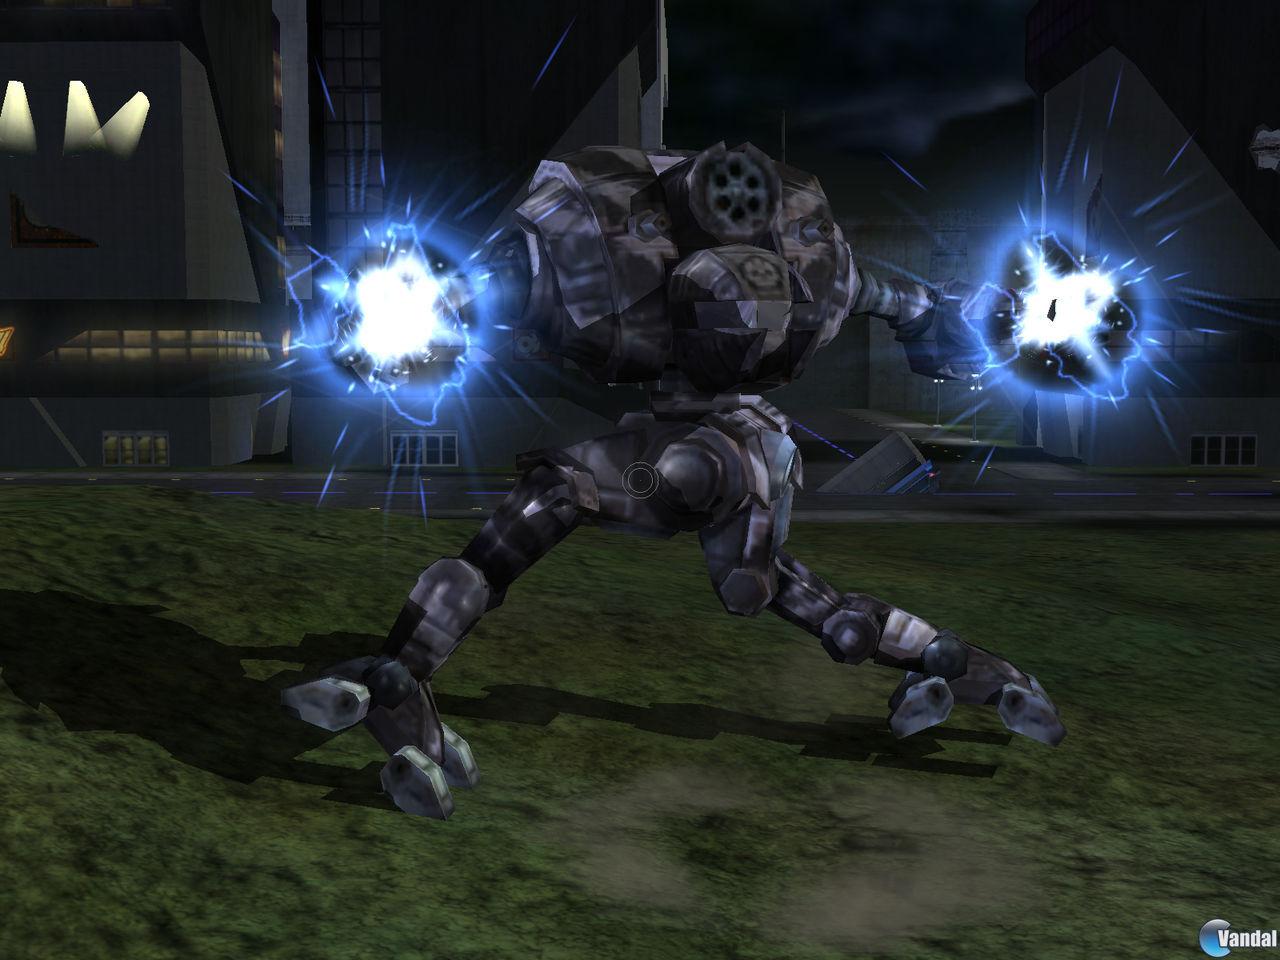 MechAssault 2: Lone Wolf, nuevas imágenes